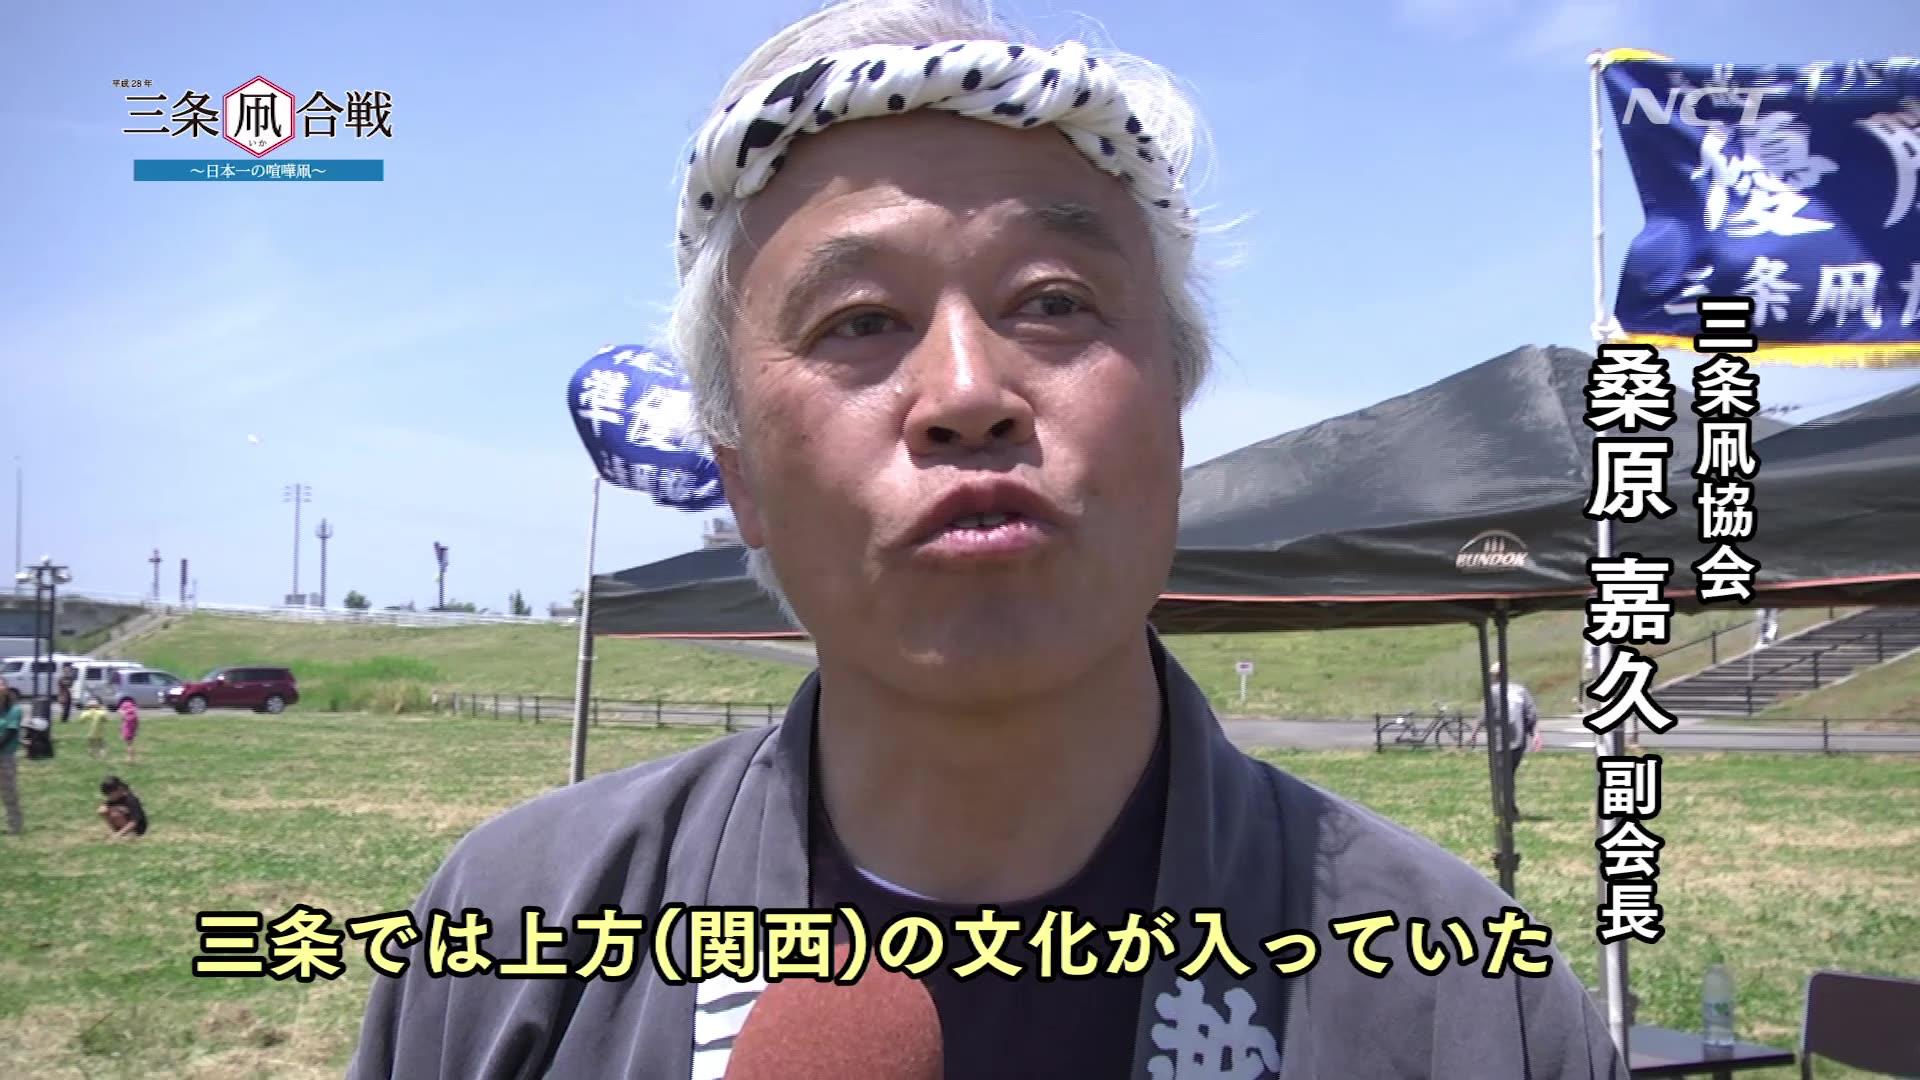 The Sanjo Great Kite Battle Episode 1